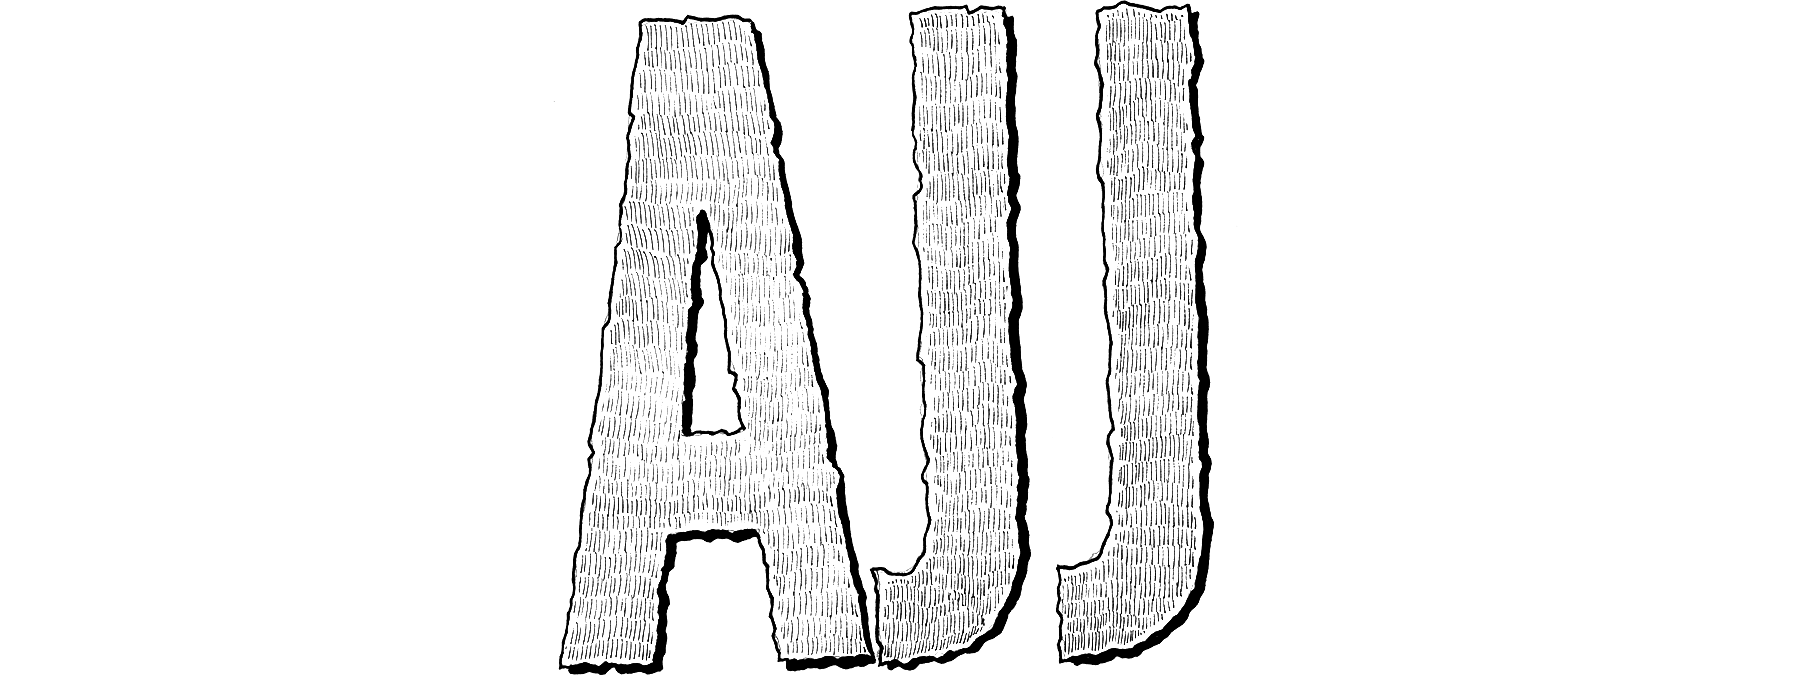 AJJ-logo-bw-on-trans